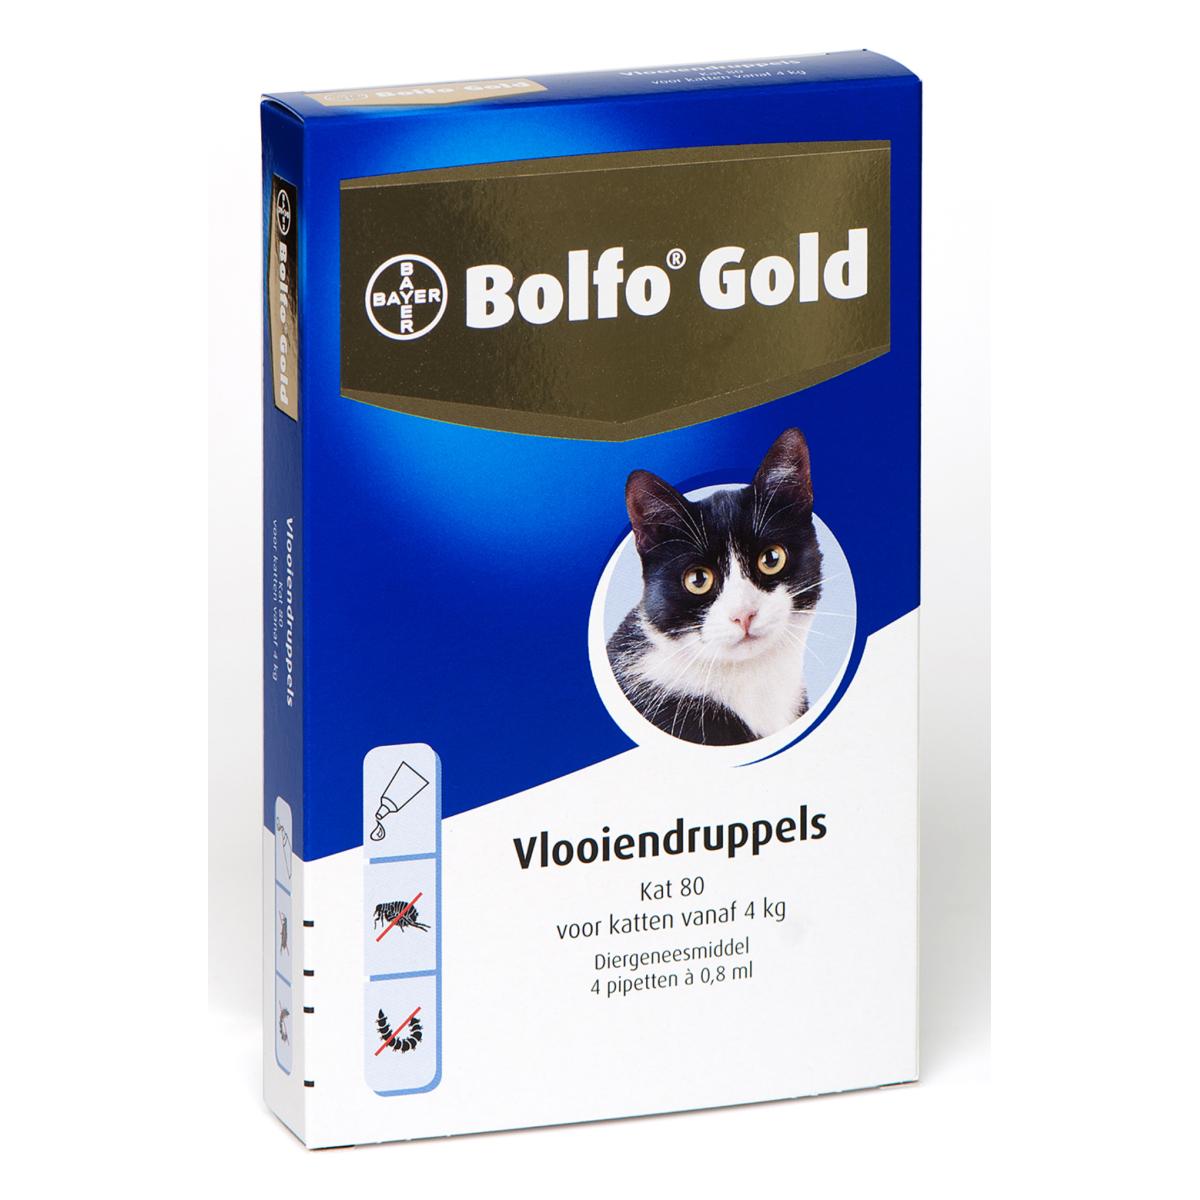 Katten > Verzorging & apotheek > Anti-vlo & anti-teek